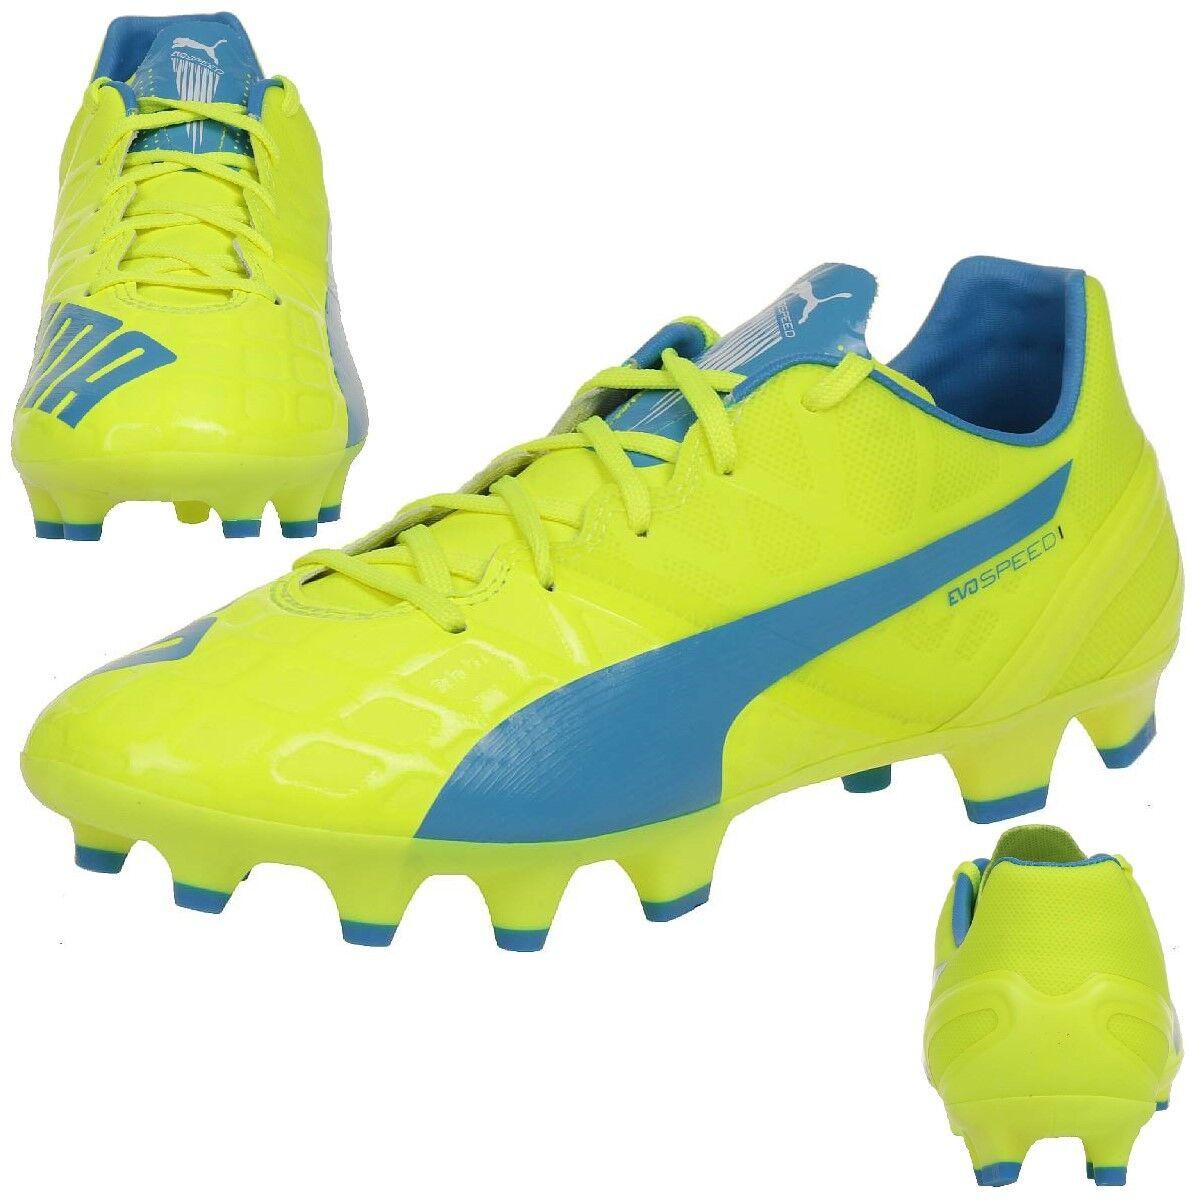 Puma Evospeed 1.4 Fg Jr. Niños Zapatos de Fútbol 103495 04 Amarillo